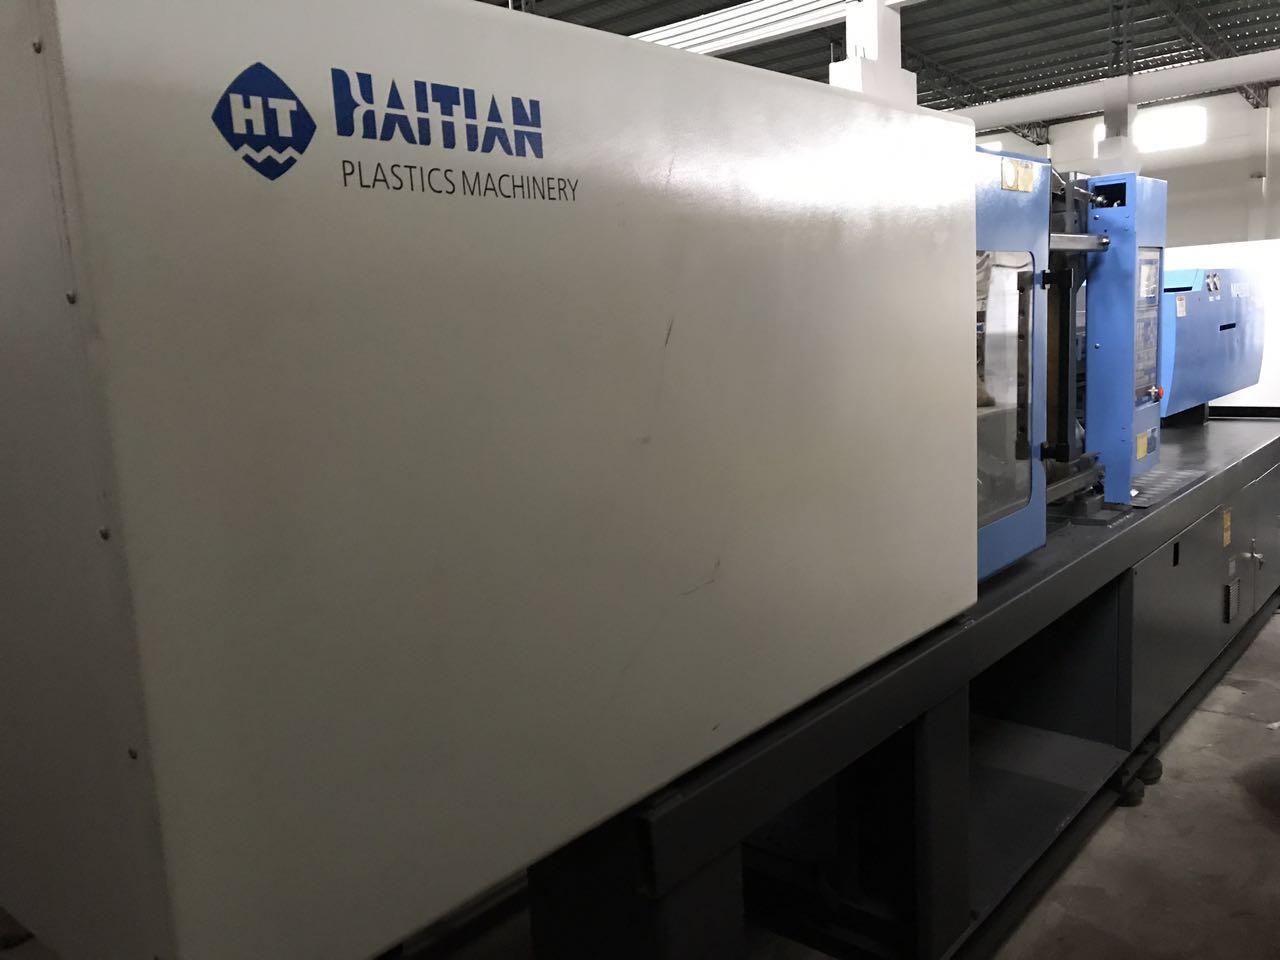 nissei injection molding machine manual pdf